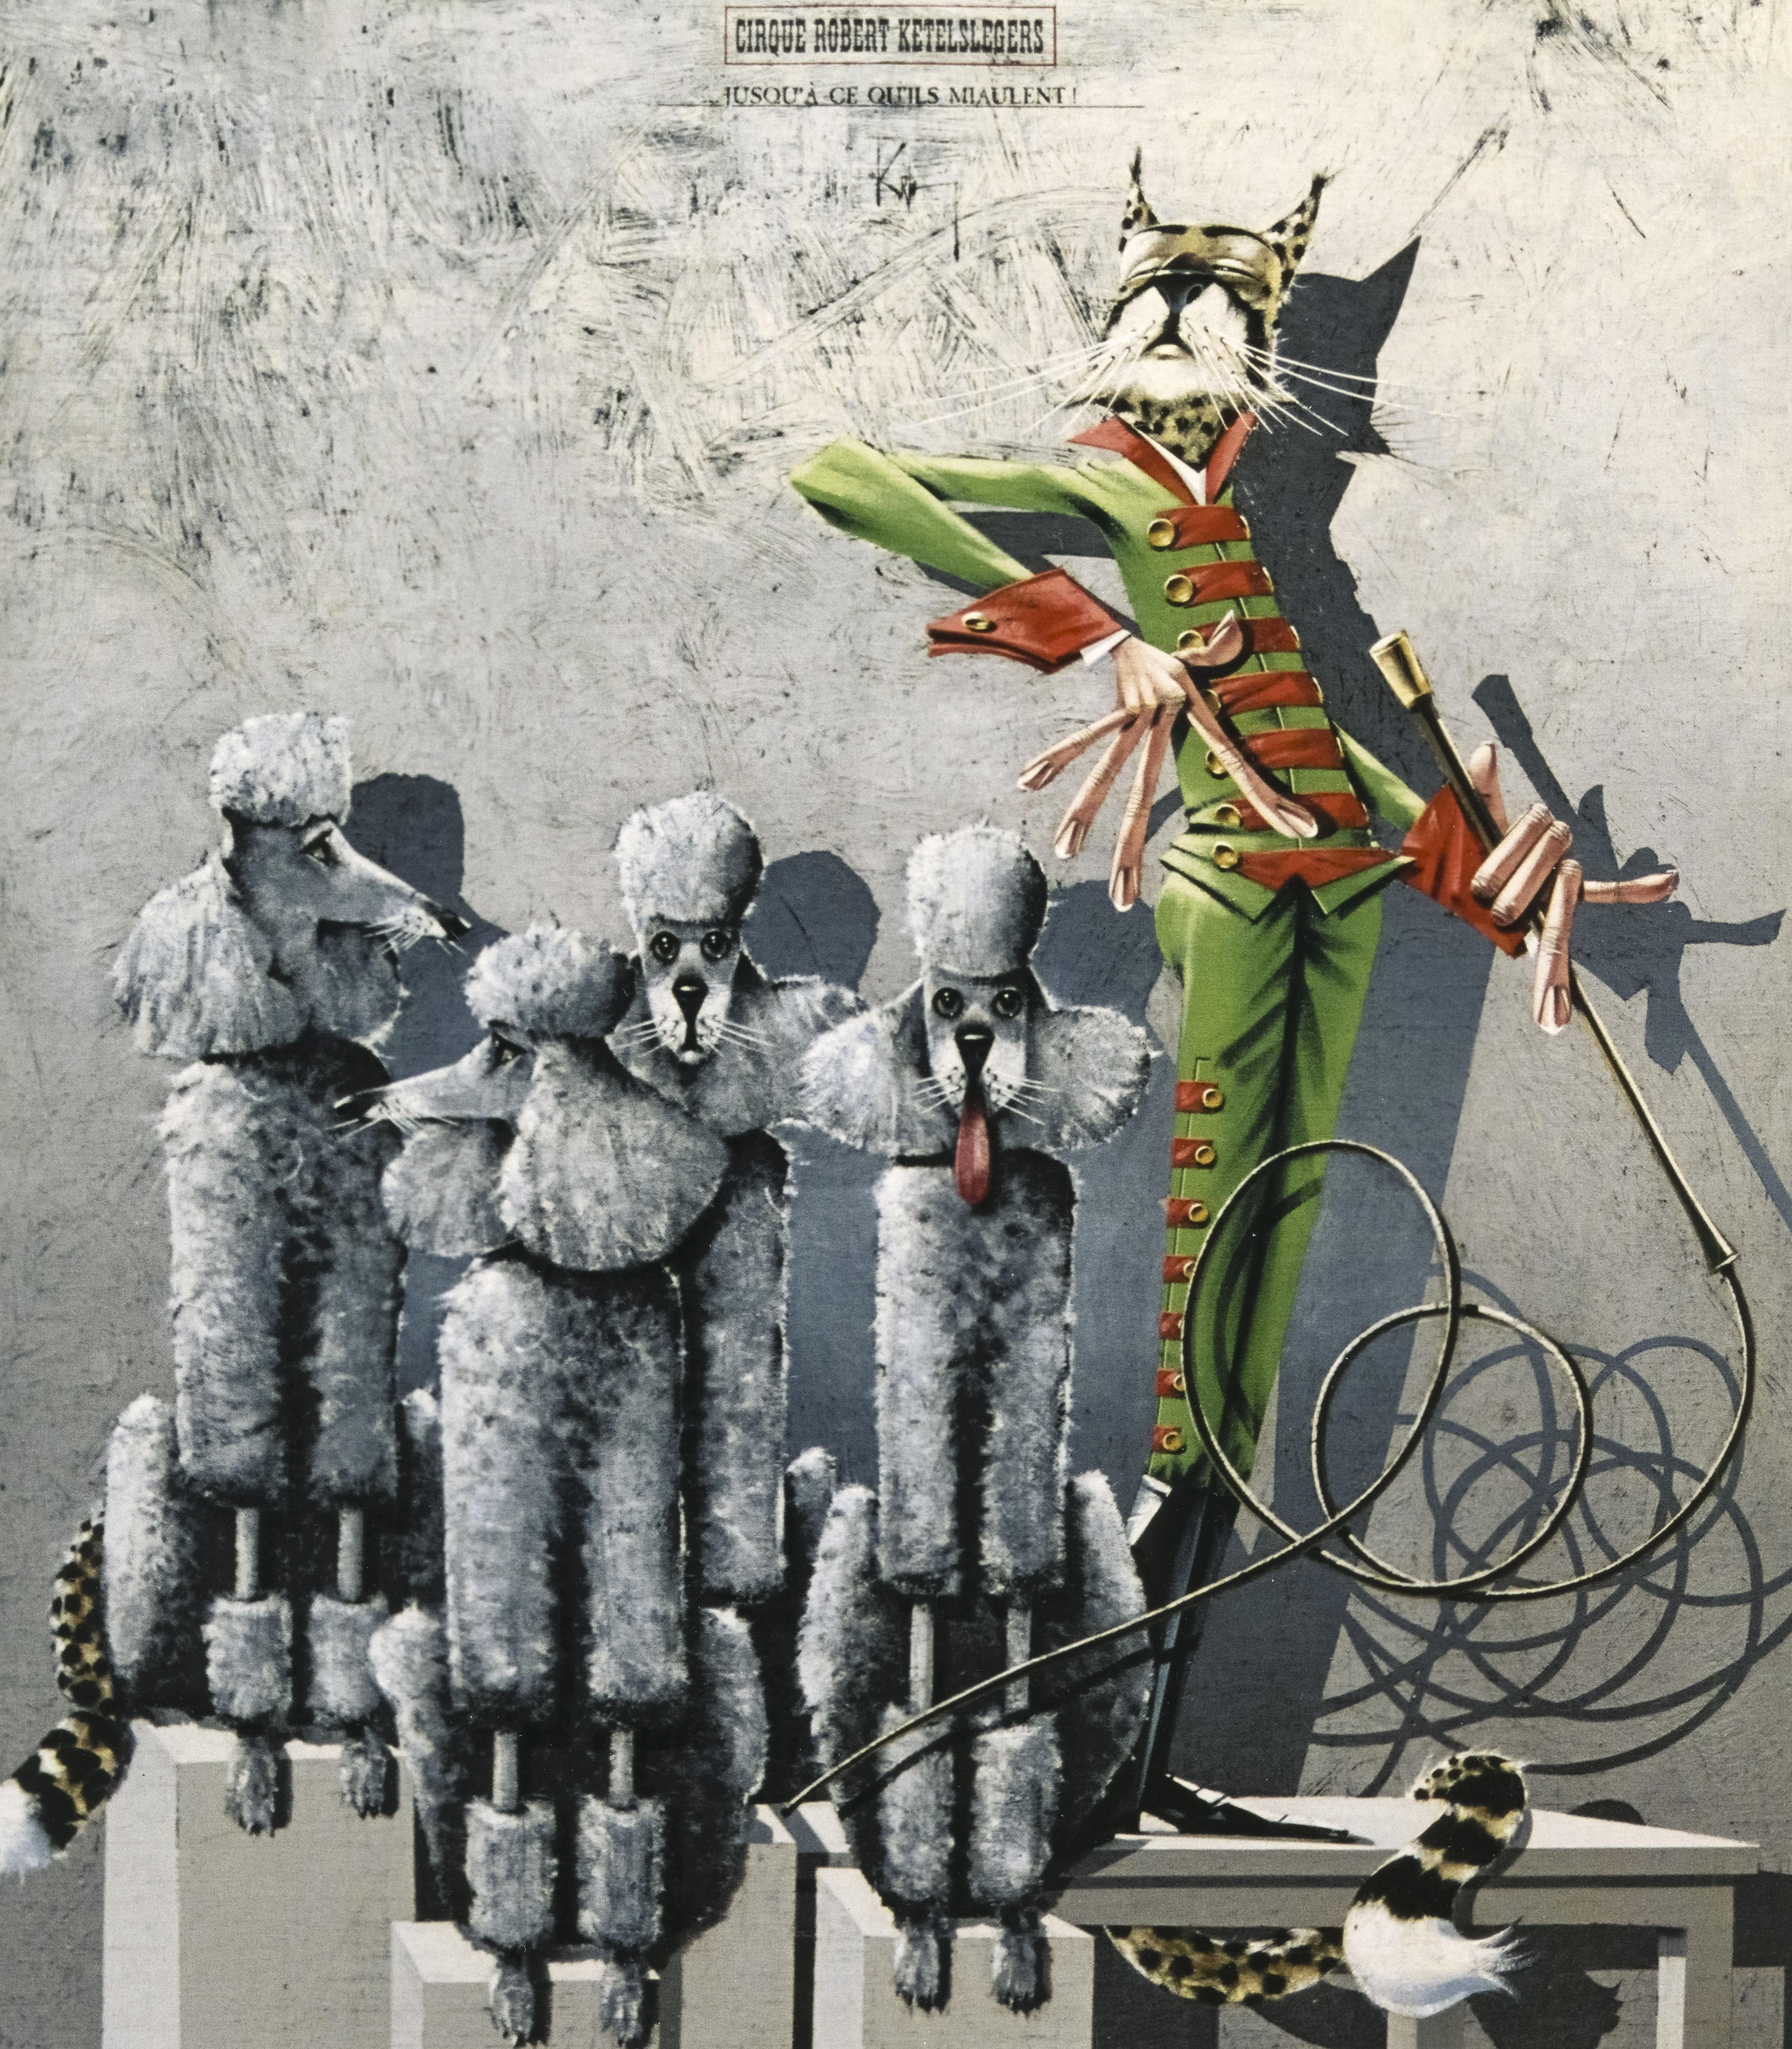 Cirque Robert Ketelslegers